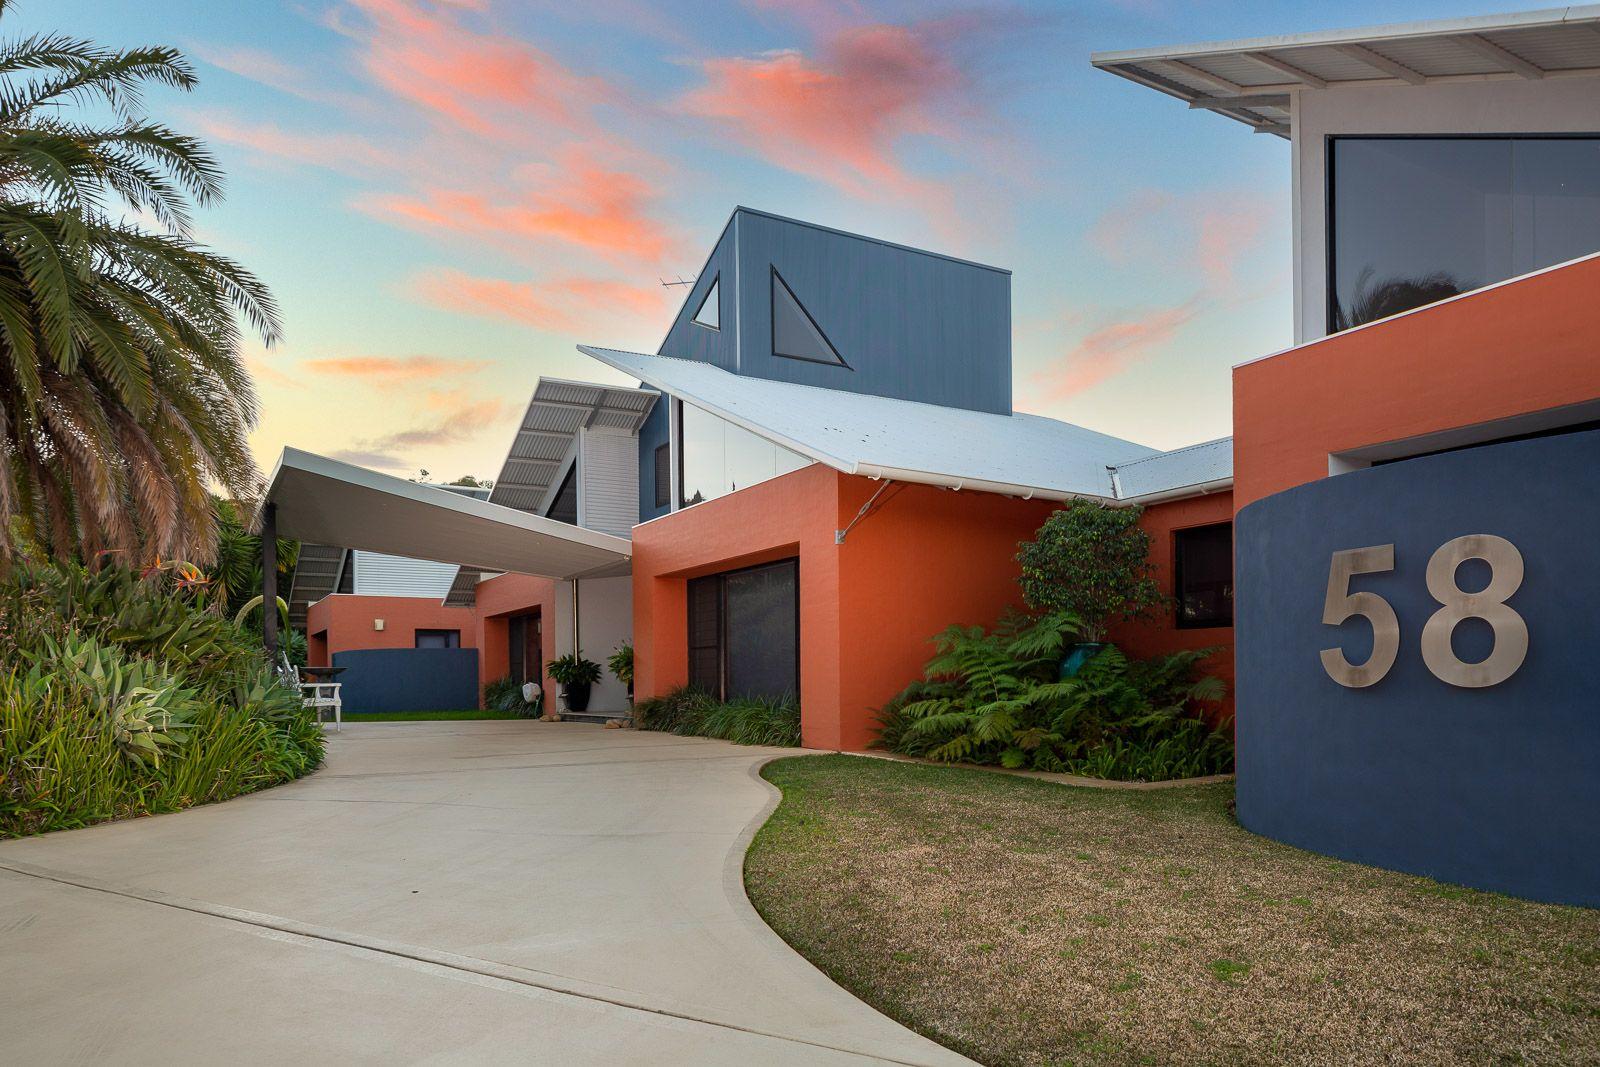 58 Yarrabee Drive, Batemans Bay NSW 2536, Image 0